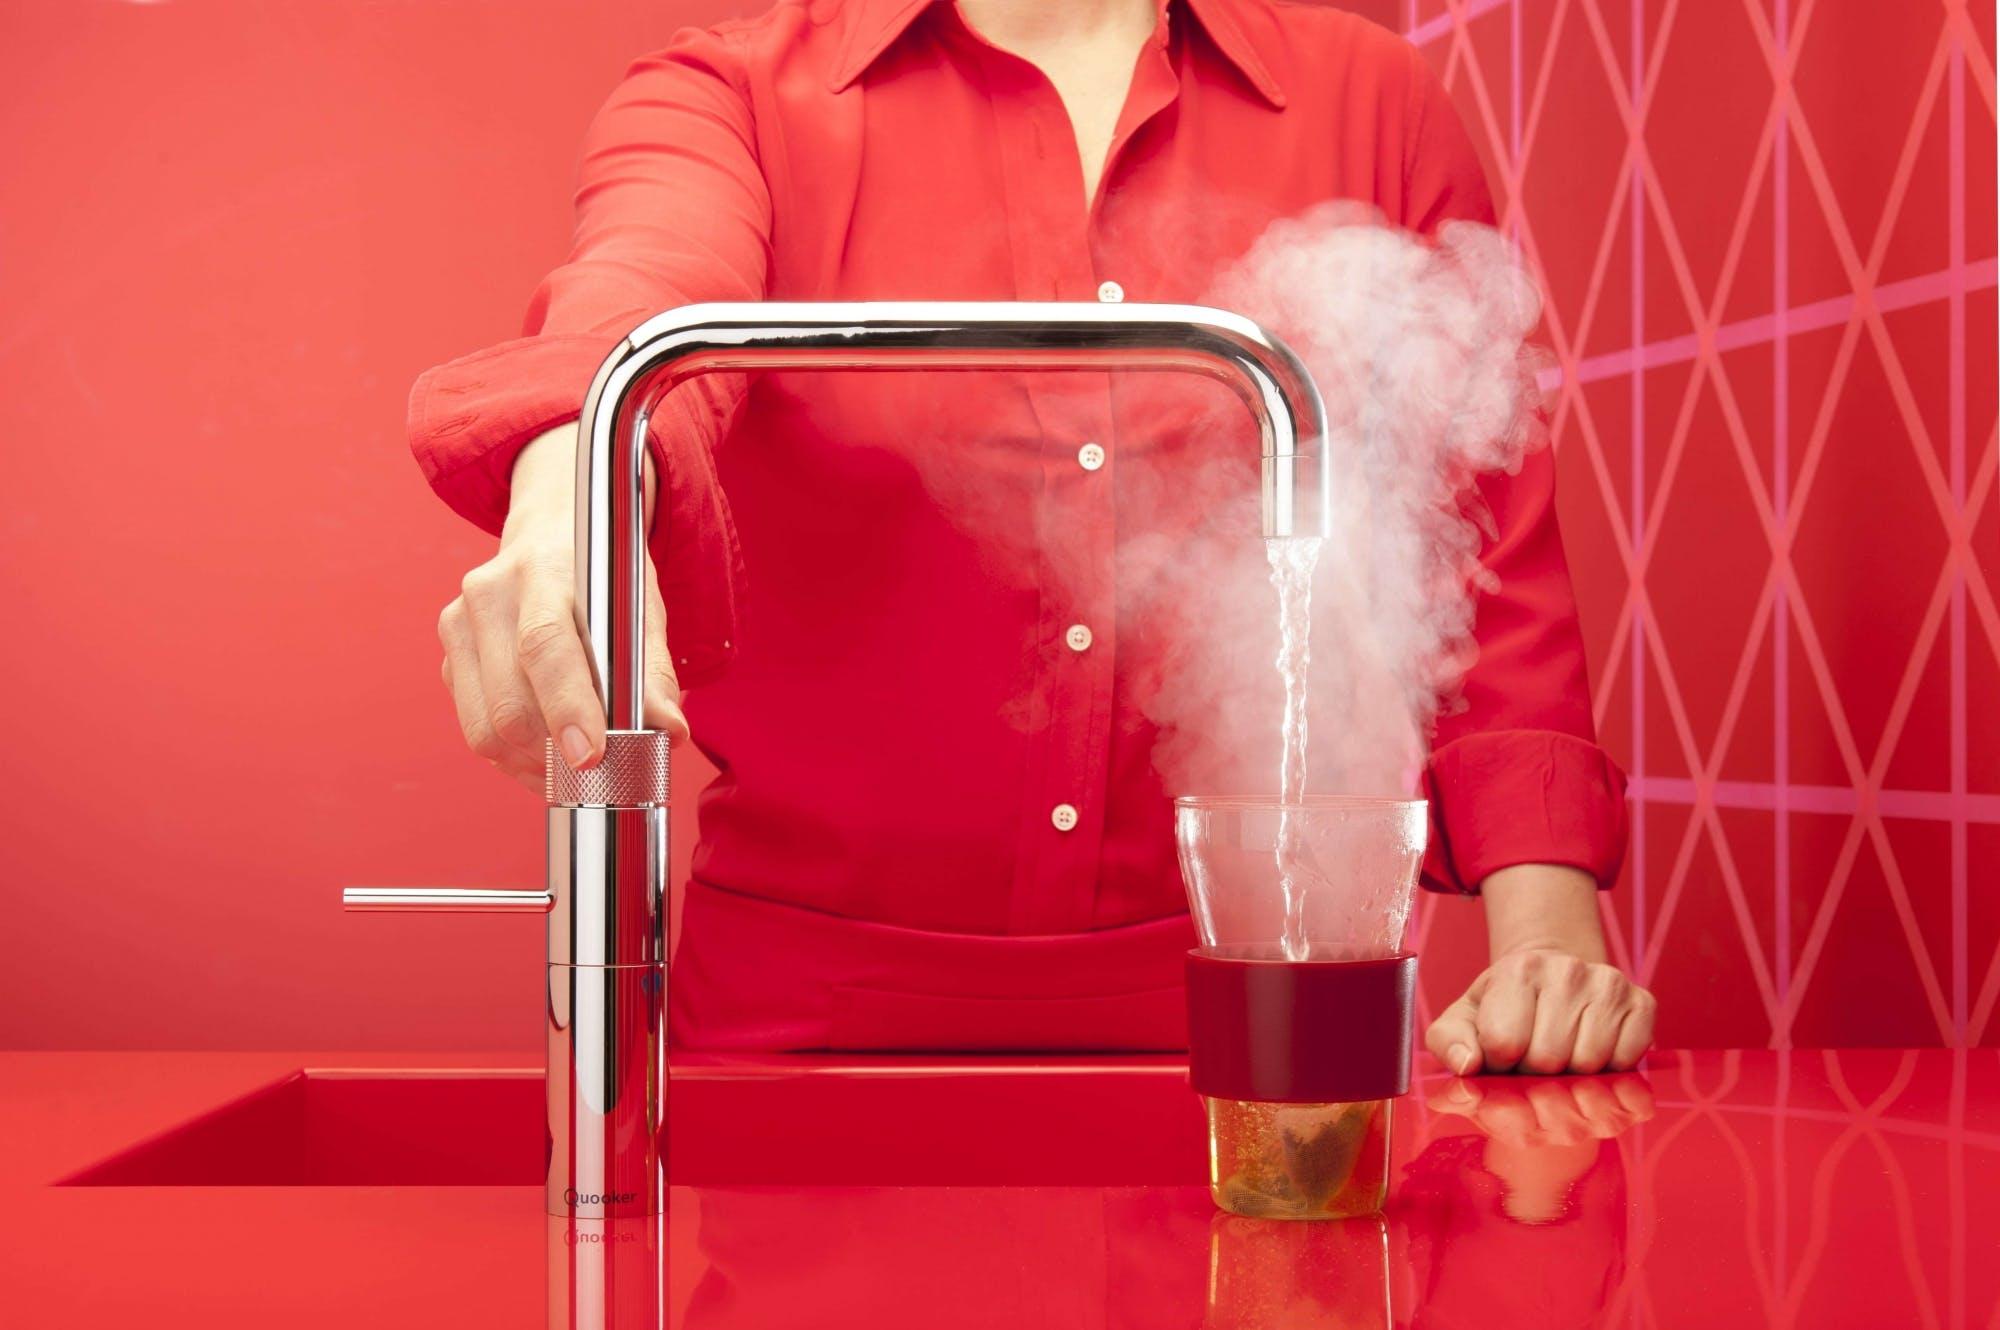 the kooker boiling water tap